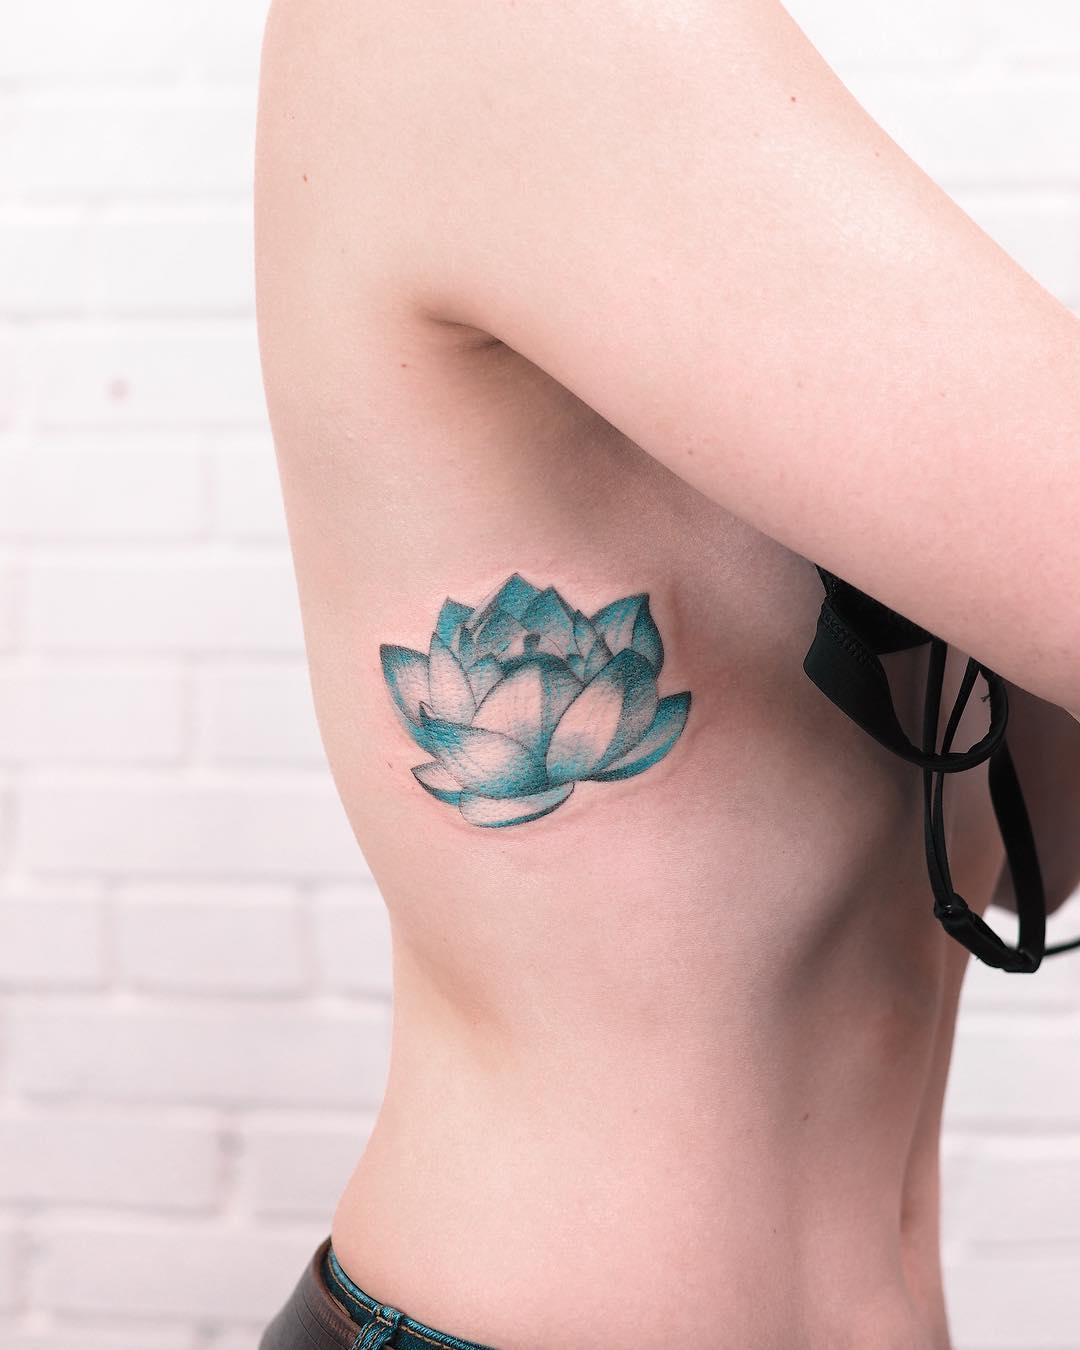 Blue Lotus by Evgeny Mel